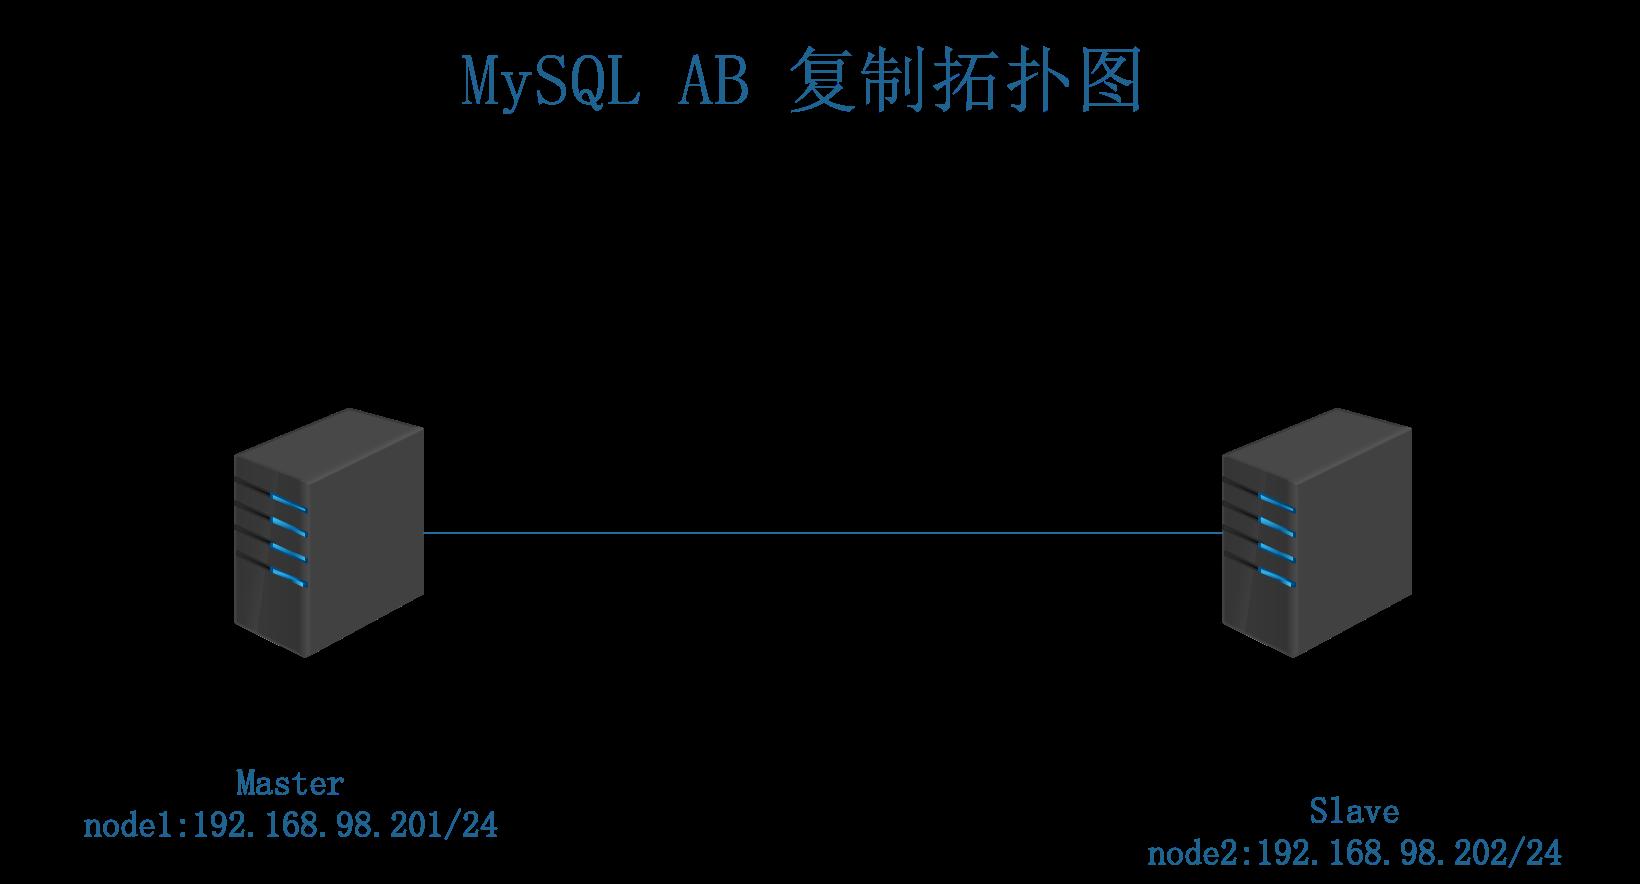 mysql_ab拓扑图.png